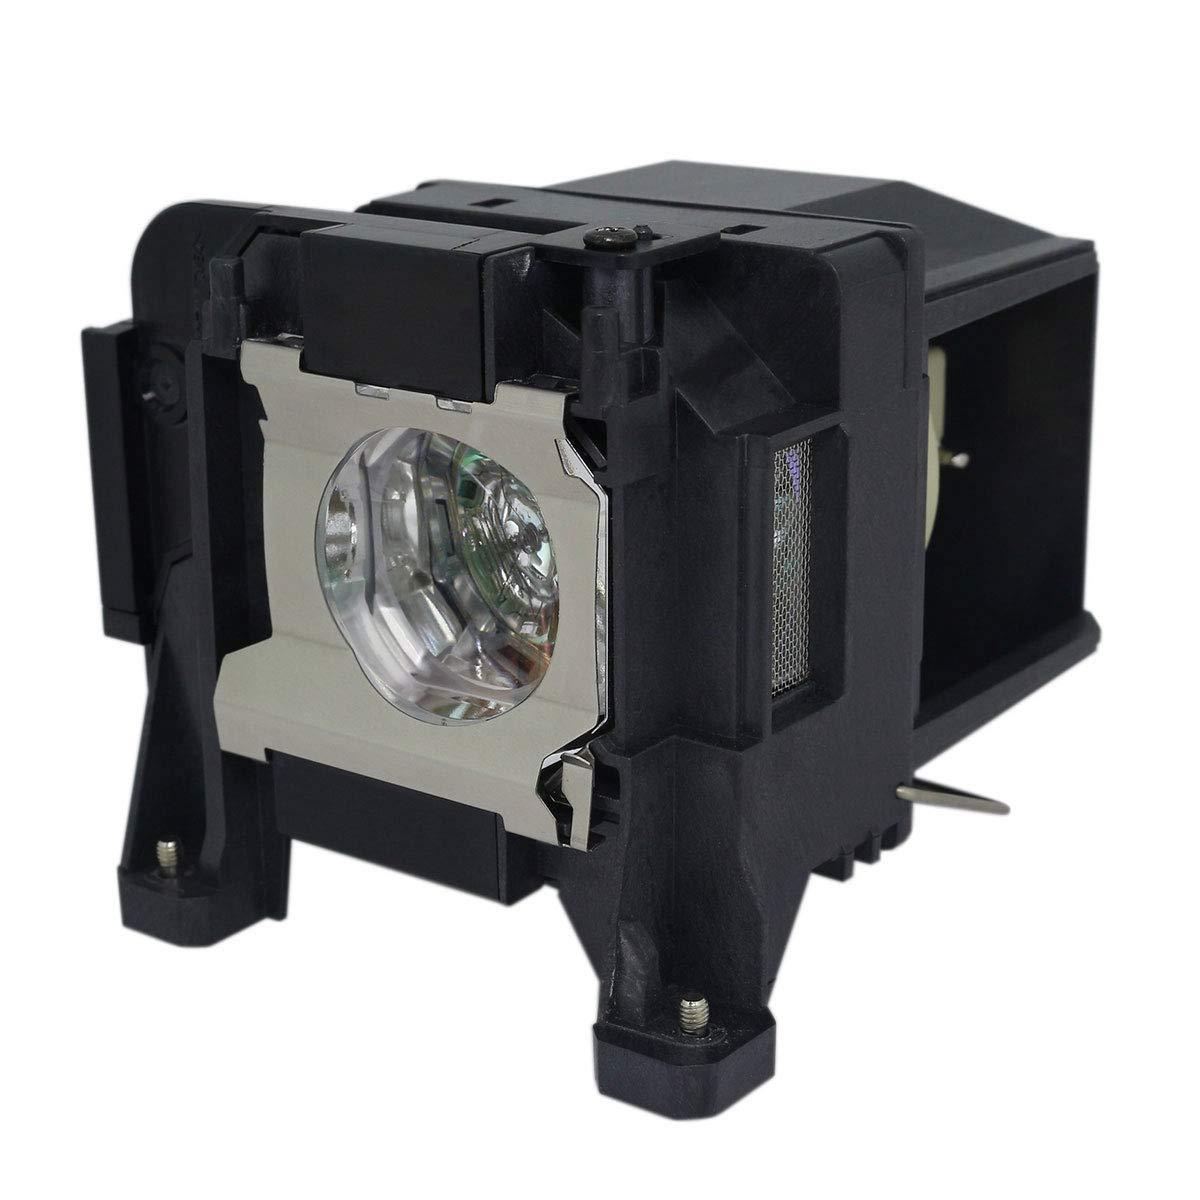 Lutema OEM プロジェクター交換用ランプ ハウジング/電球付き Epson PowerLite Home Cinema 5040UB用 Platinum (Brighter/Durable) Platinum (Brighter/Durable) Lamp with Housing B07KTKQFG4